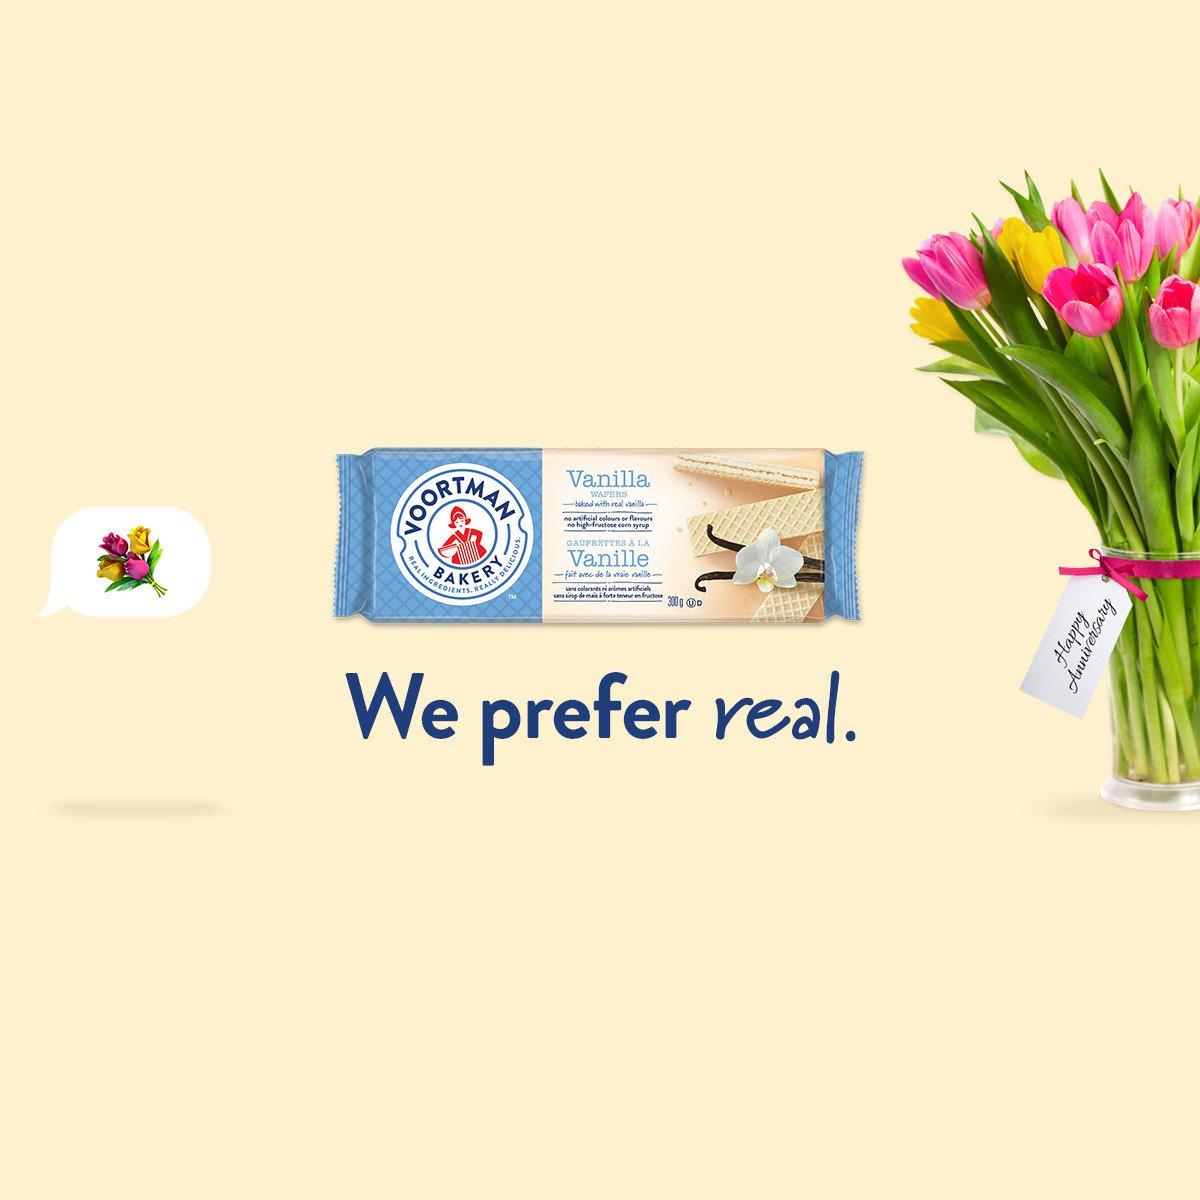 Voortman Bakery On Twitter Hrm Flower Emoji Or A Fresh Bouquet Of